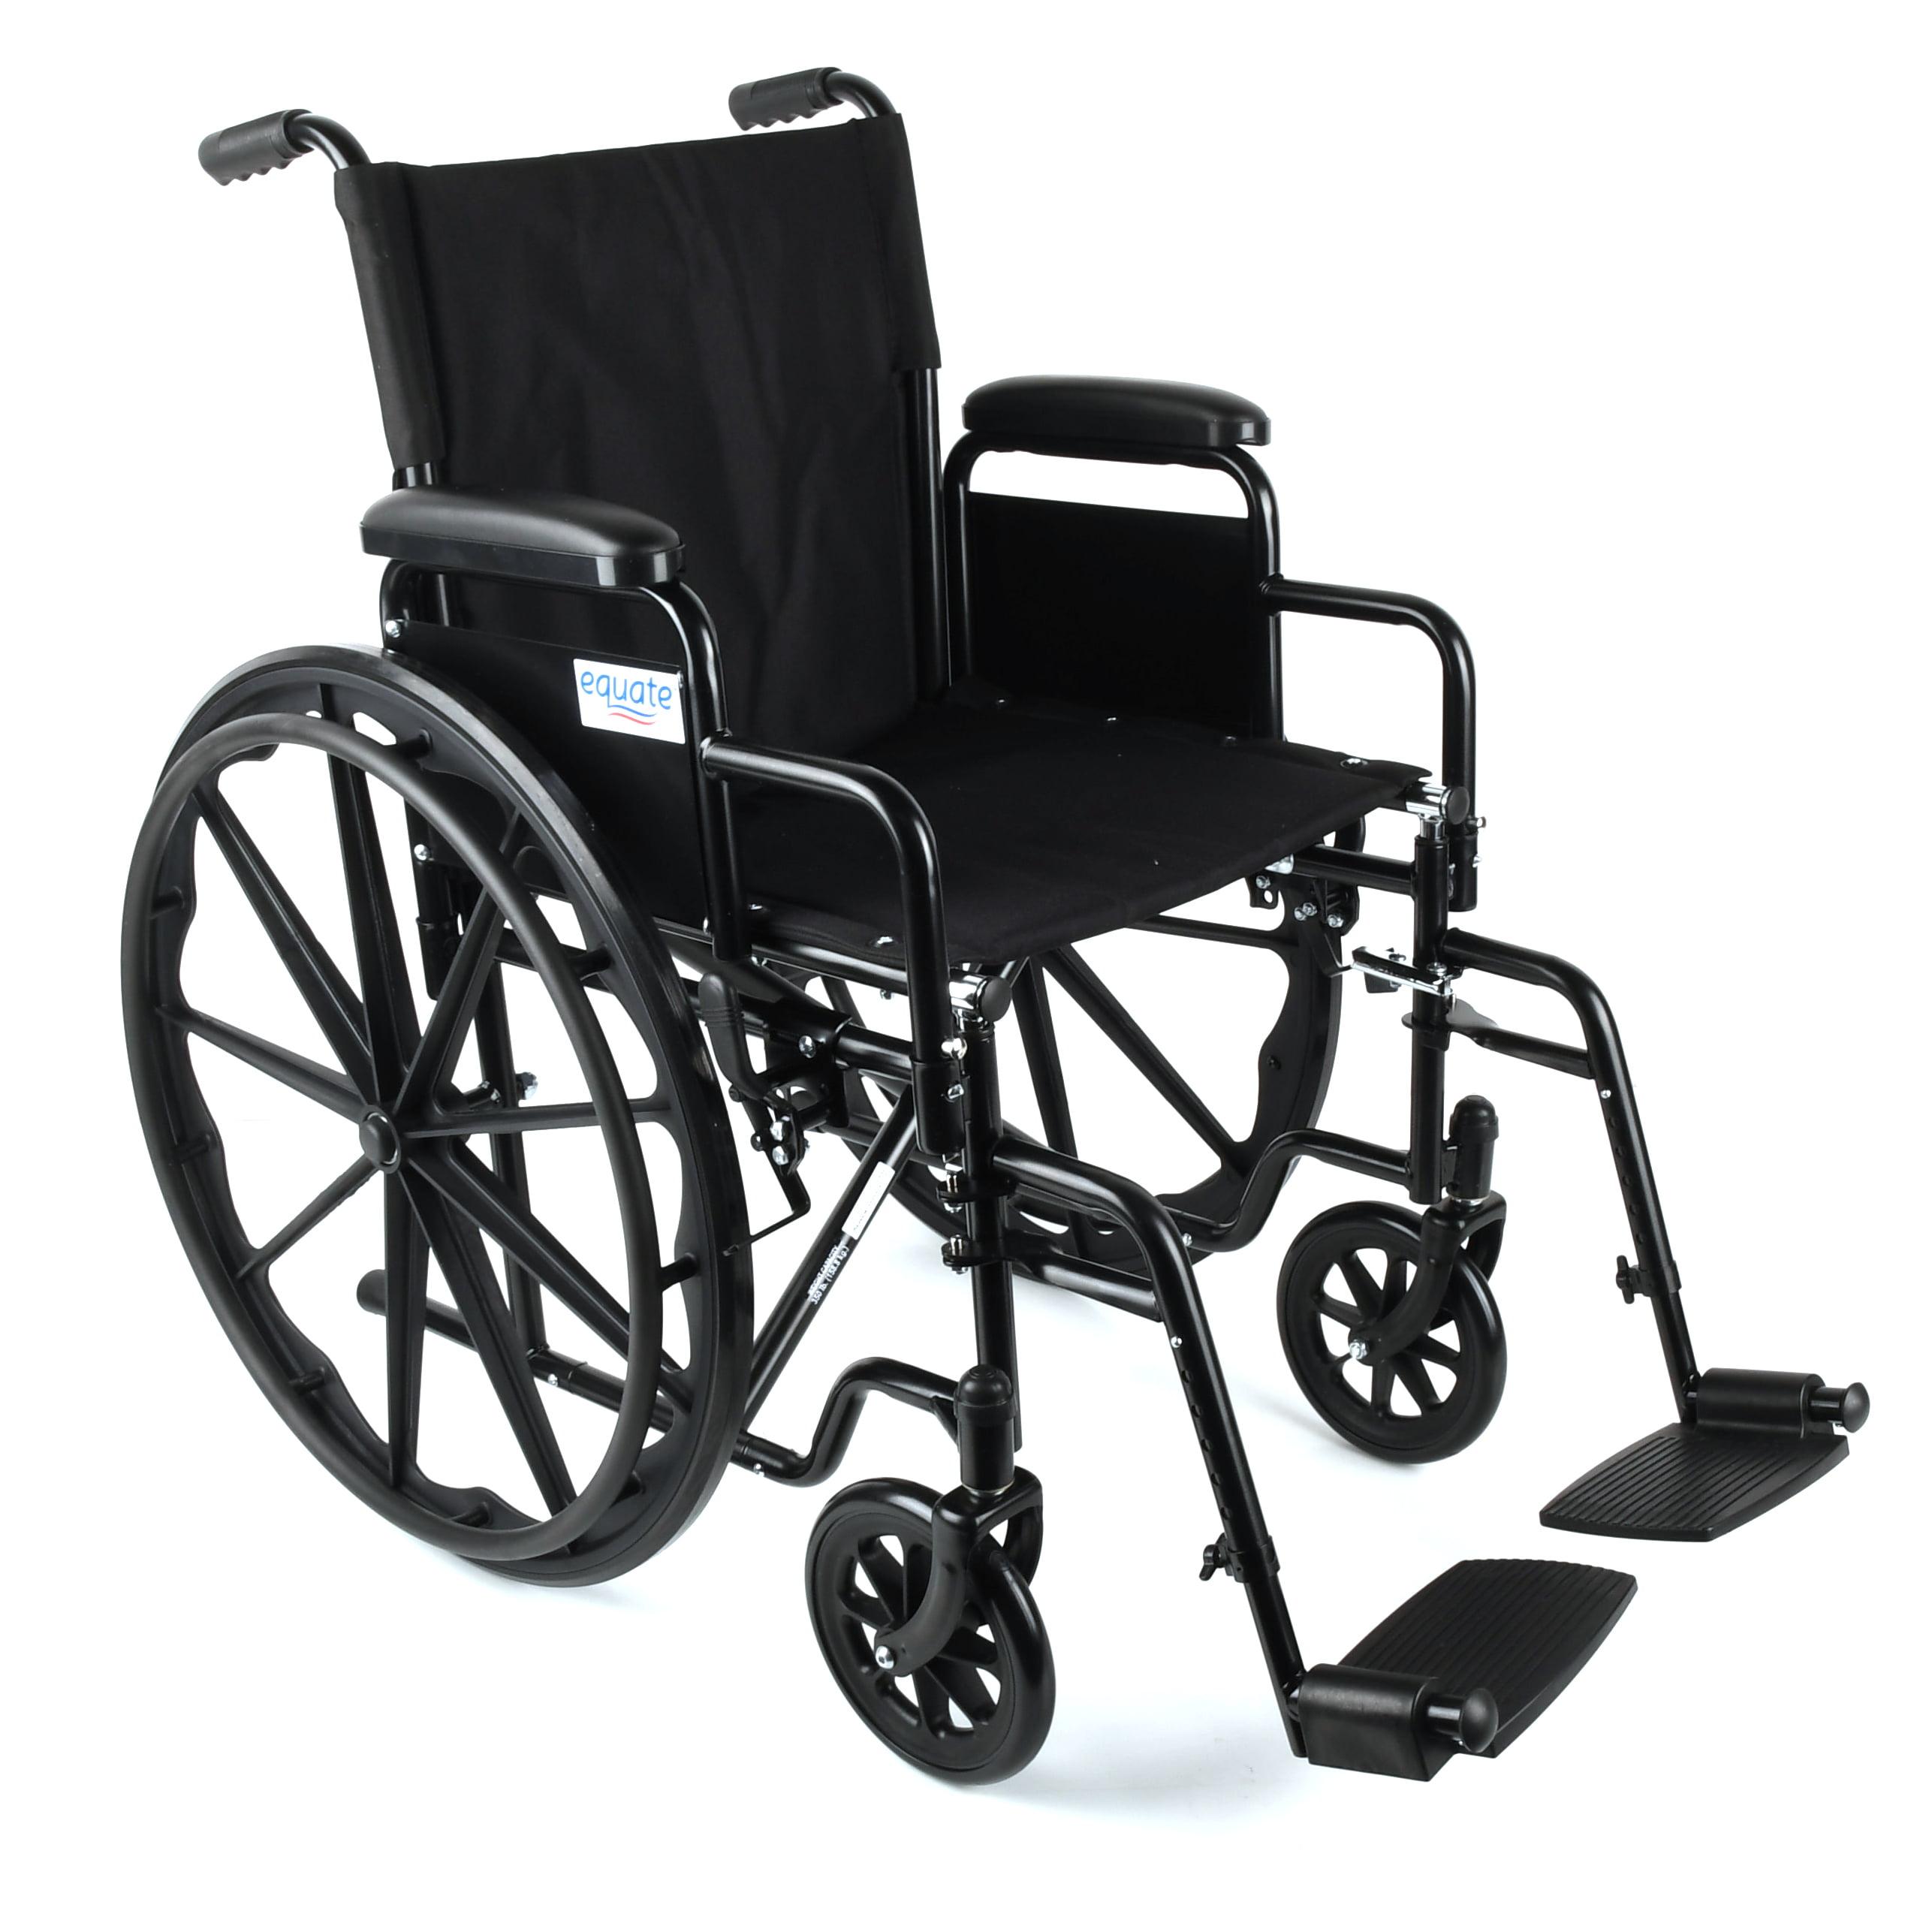 Equate Transport Wheelchair, Black